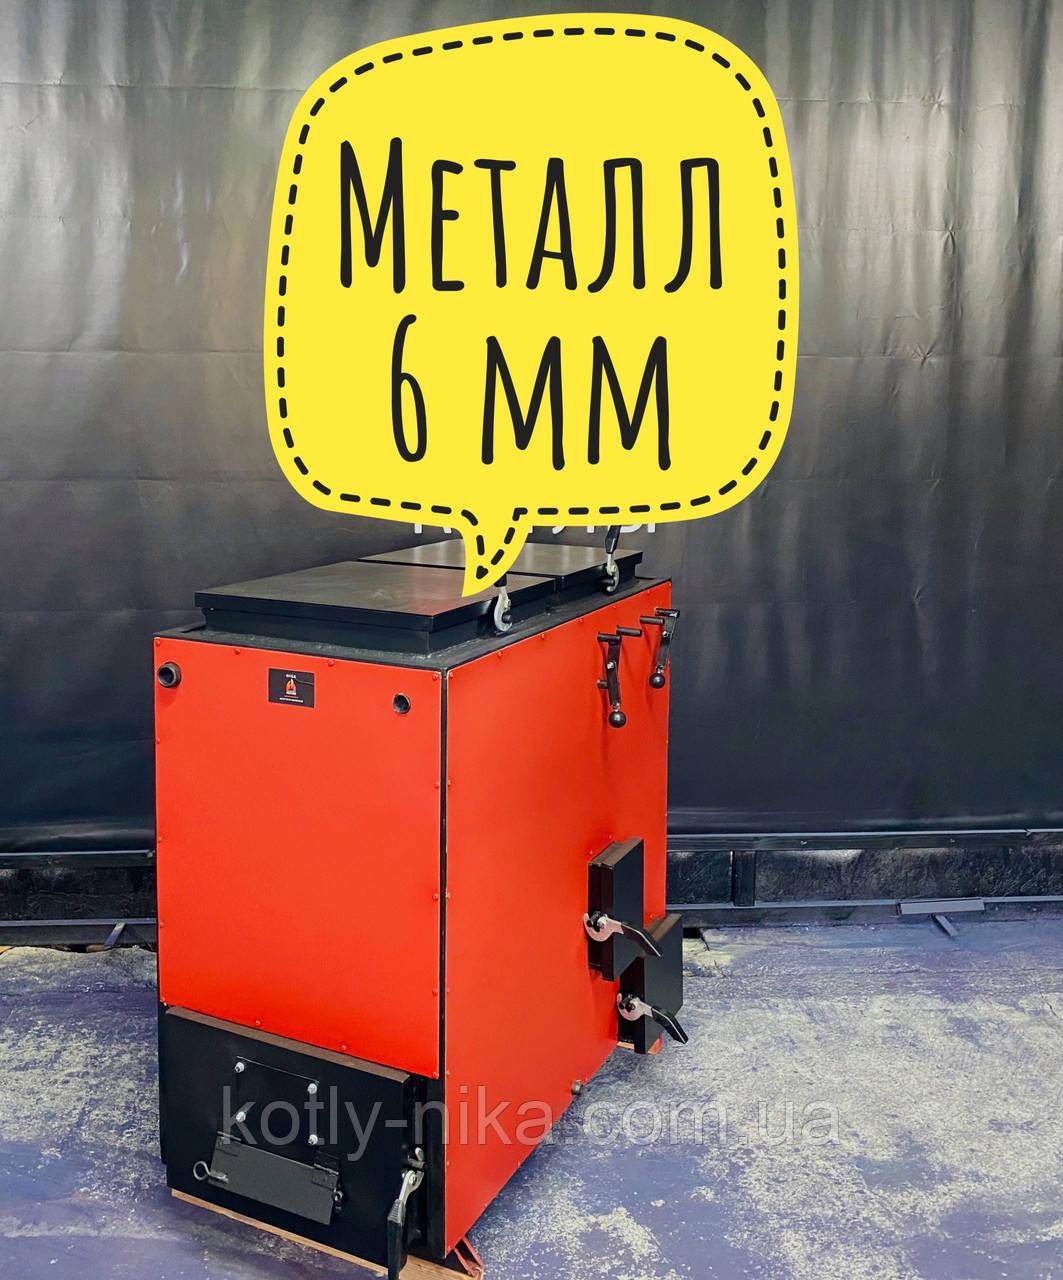 Котел Питон 25 кВт с регулировкой мощности МЕТАЛЛ 6 мм